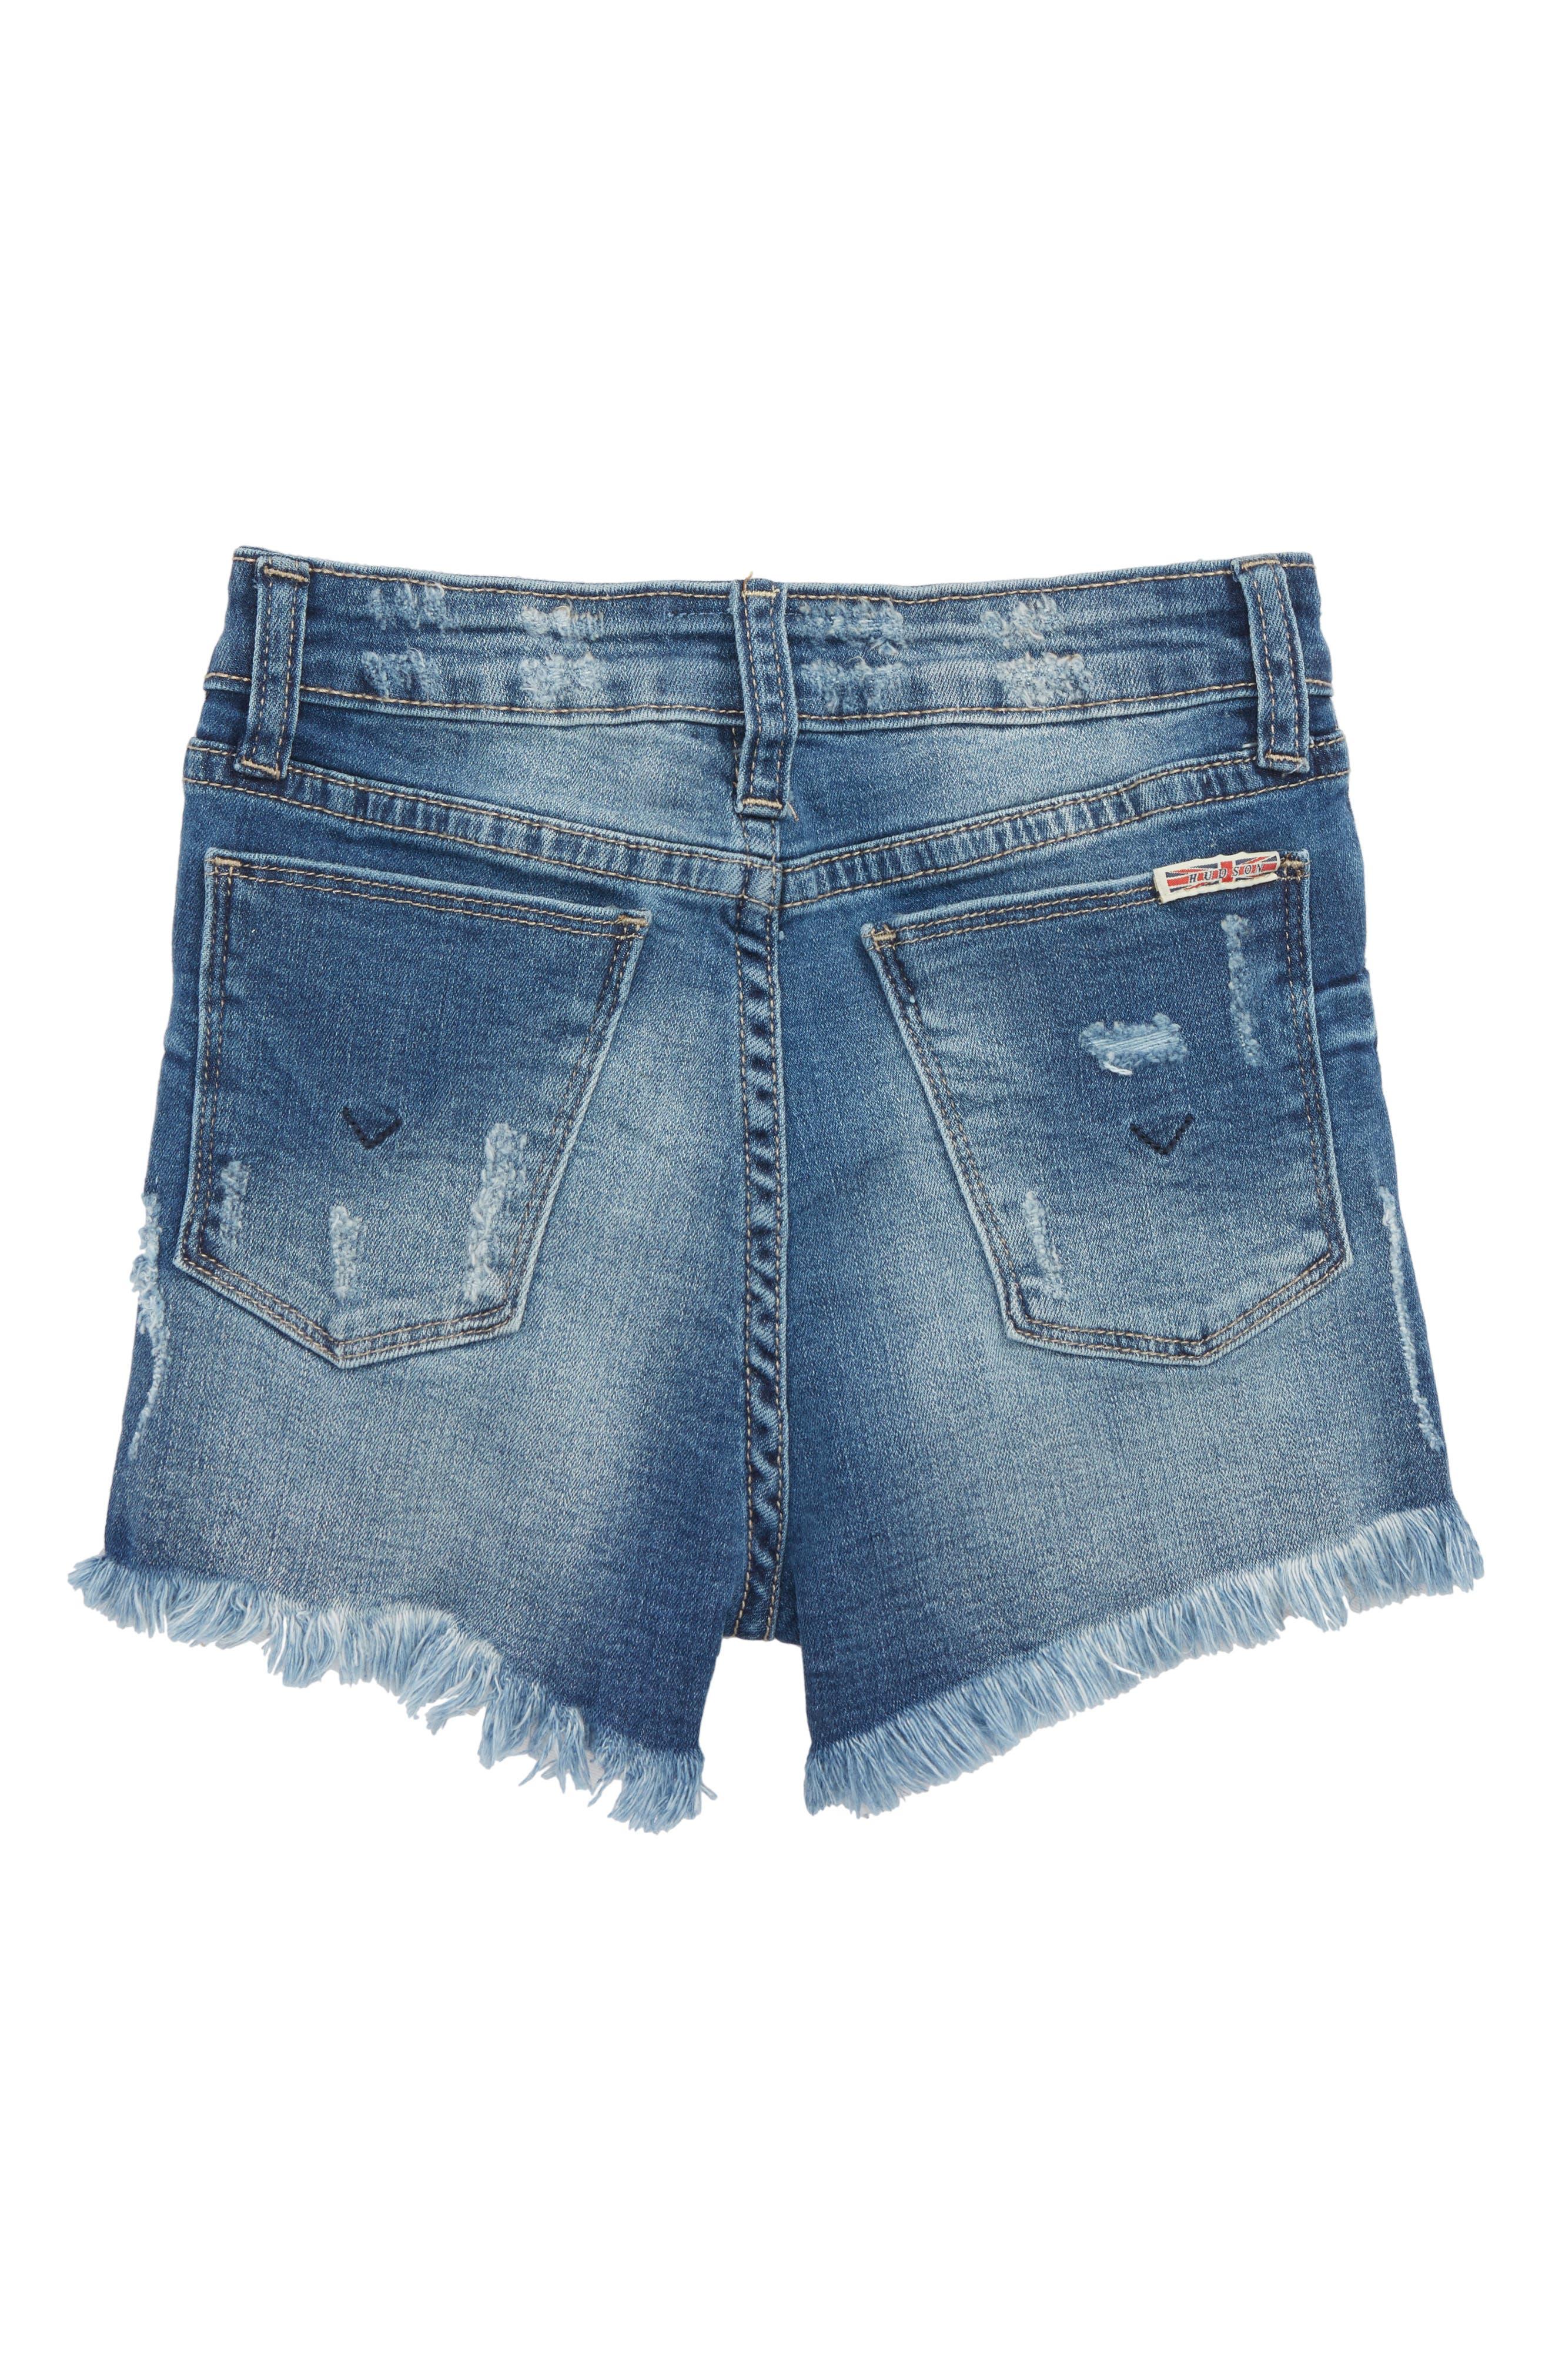 Lily High Waist Cutoff Denim Shorts,                             Alternate thumbnail 2, color,                             Iom-Indigo Mix